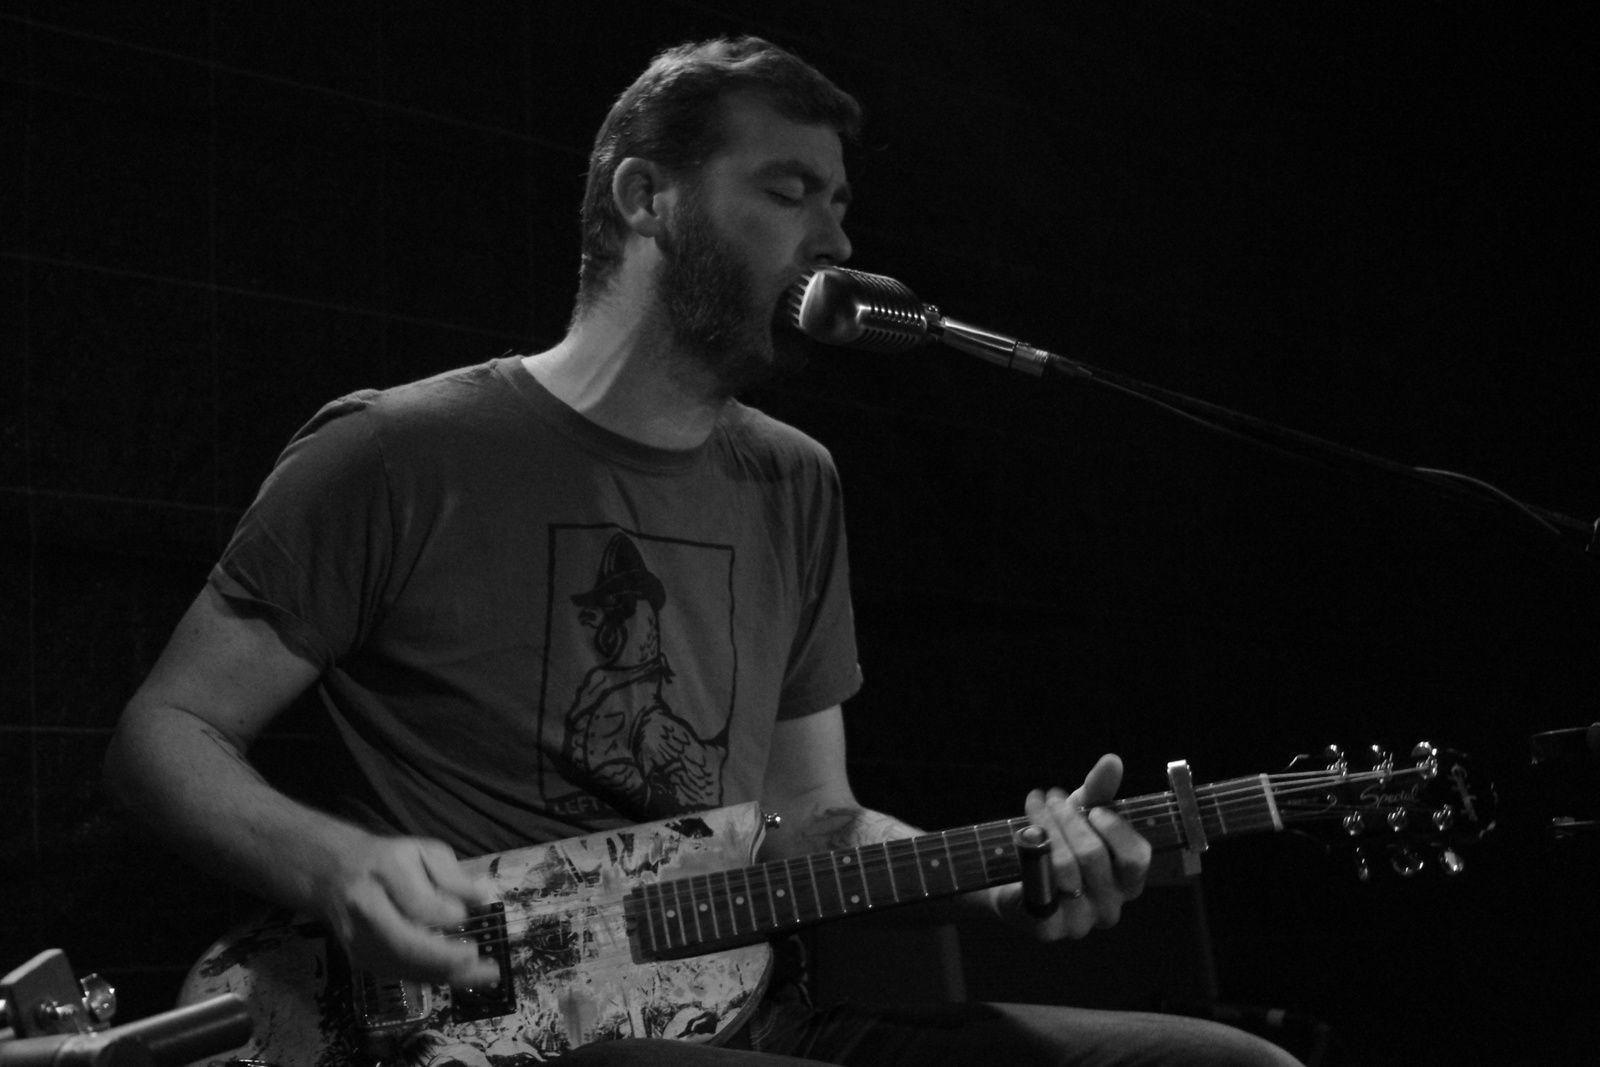 Ronan One Man Band - 11/11/2017 - Blaublues Festival, Haringe (B)